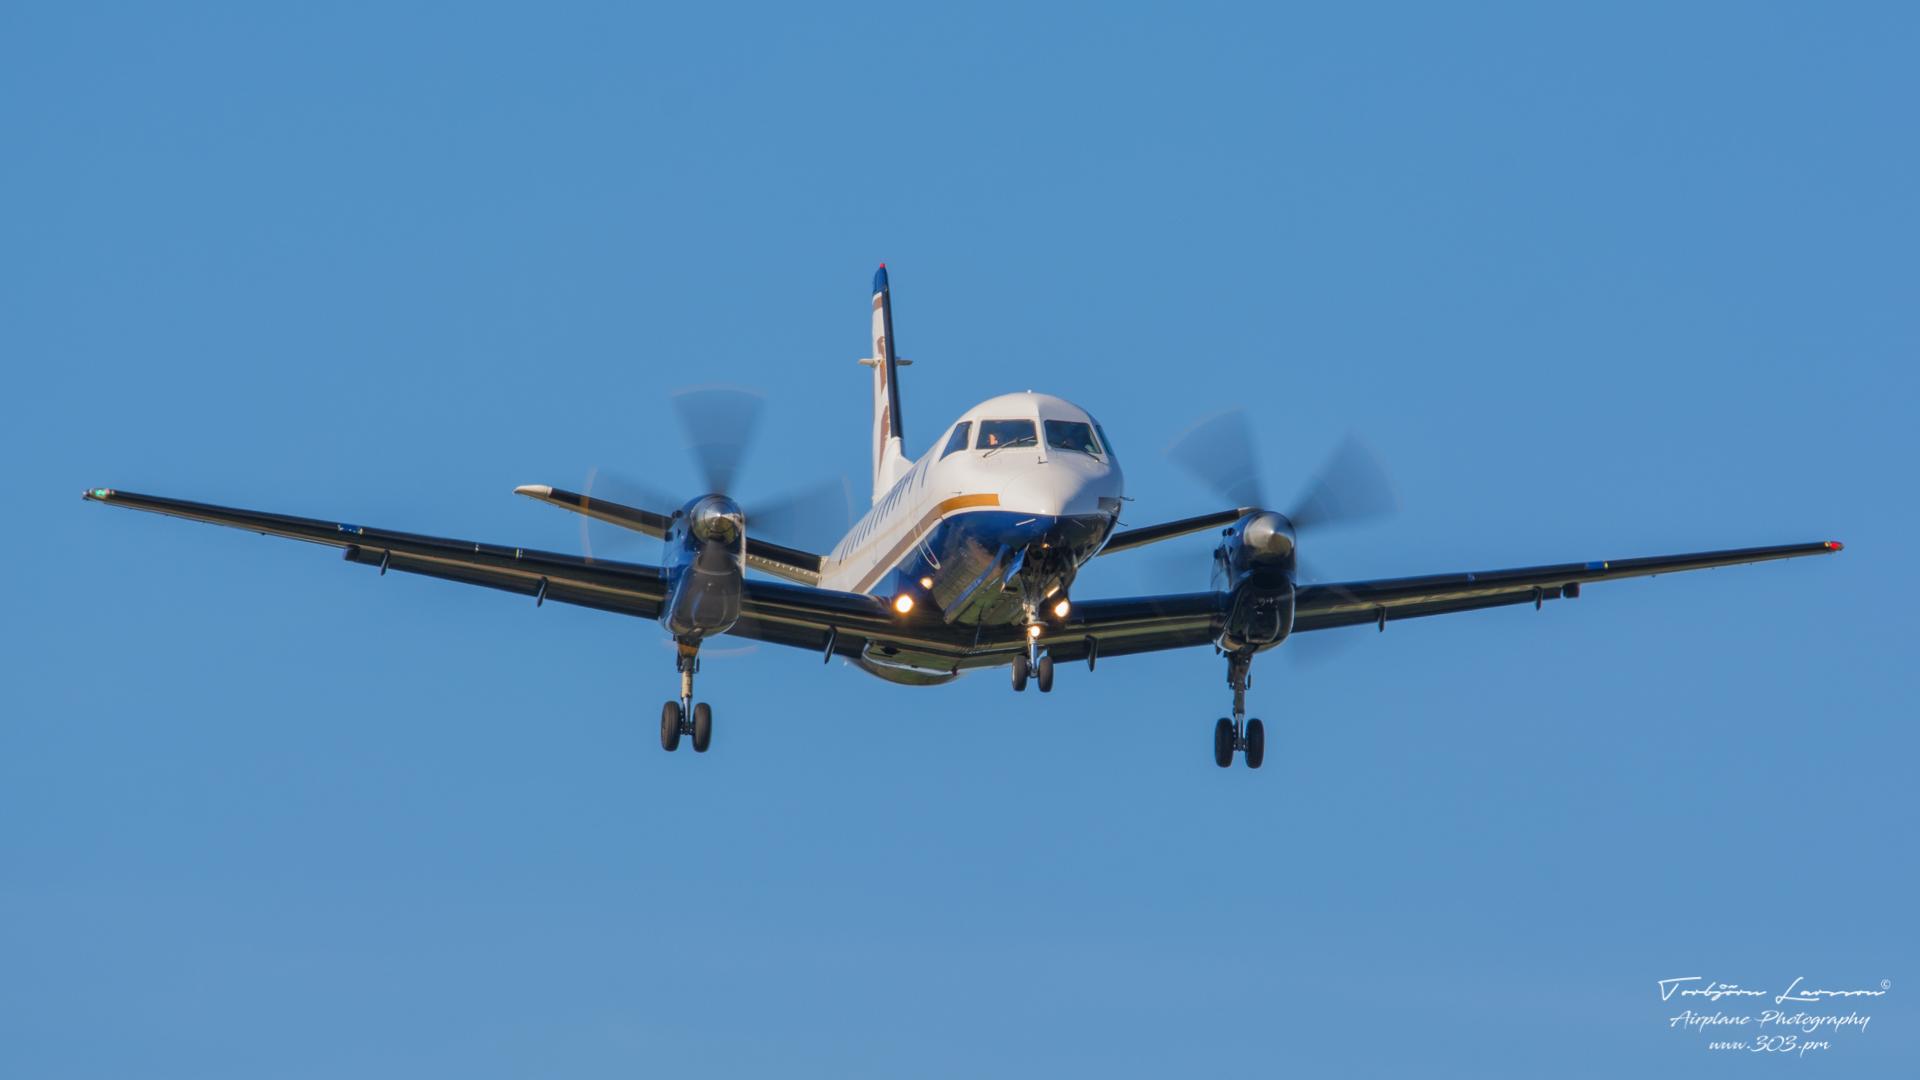 DSC_3507-Saab 340-B - Nextjet (SE-KXD)